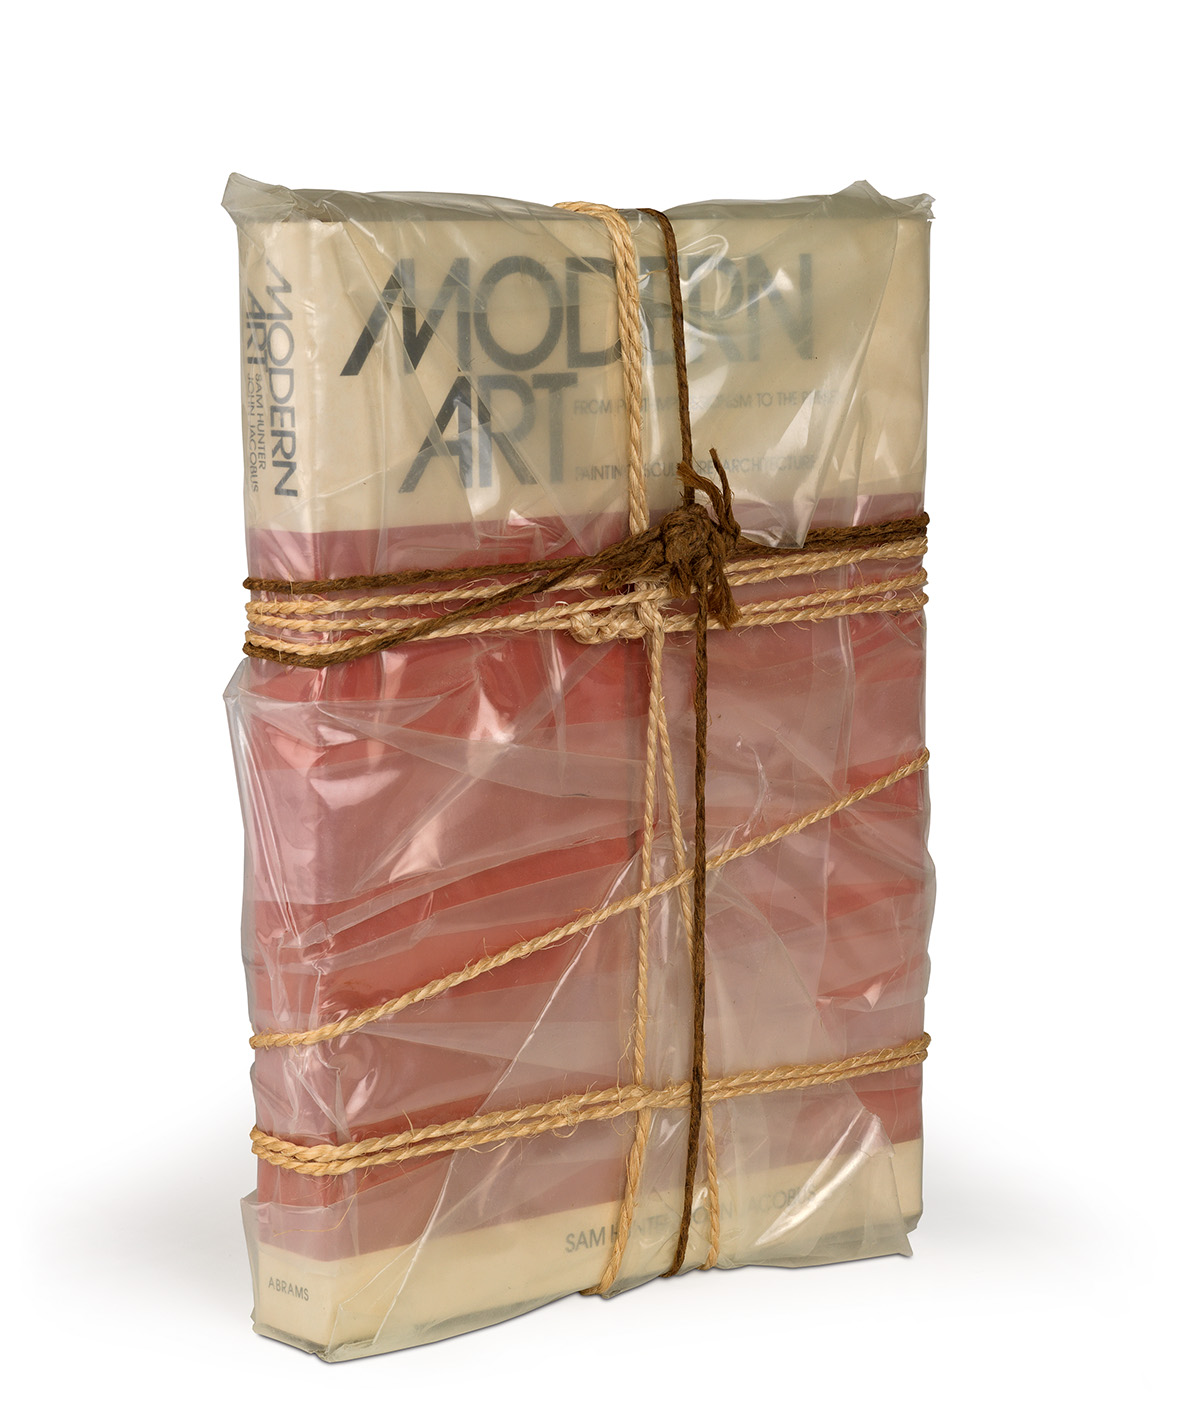 CHRISTO Wrapped Book Modern Art.